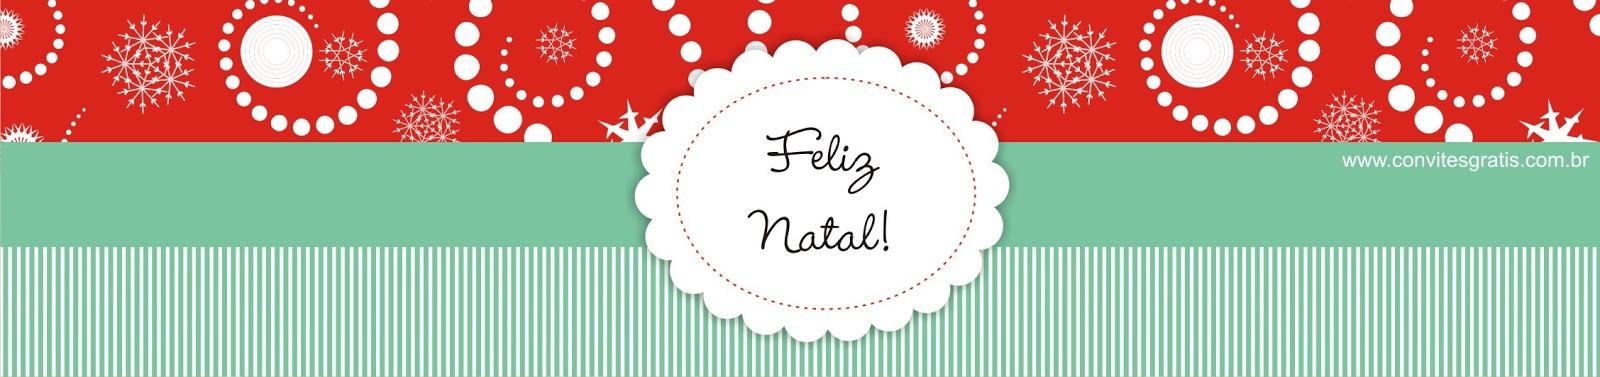 adesivo natal gratis